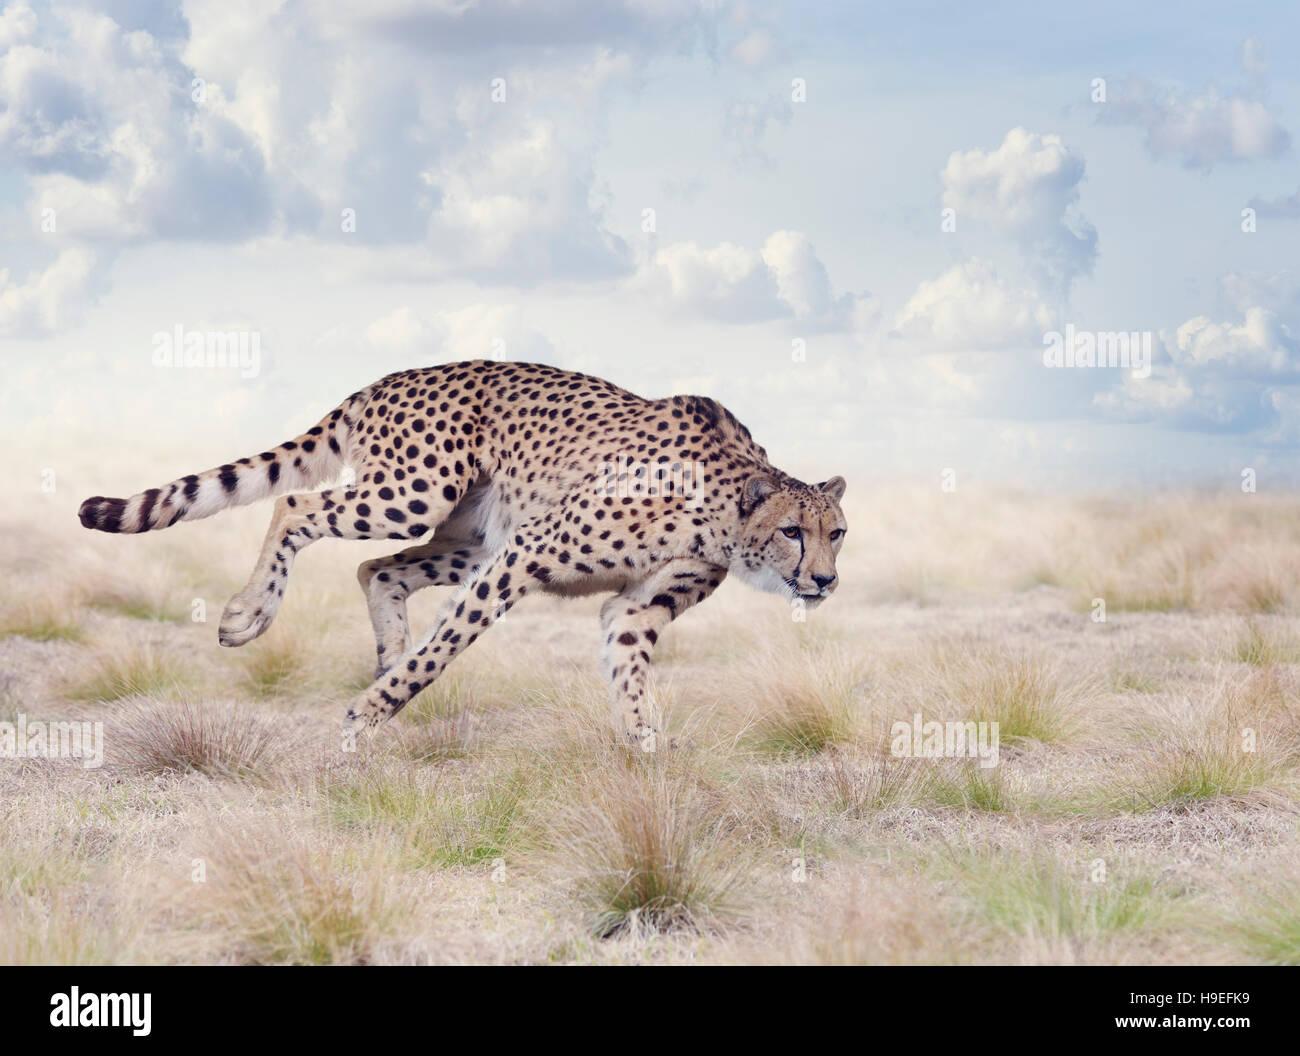 Cheetah tournant dans la prairie Photo Stock